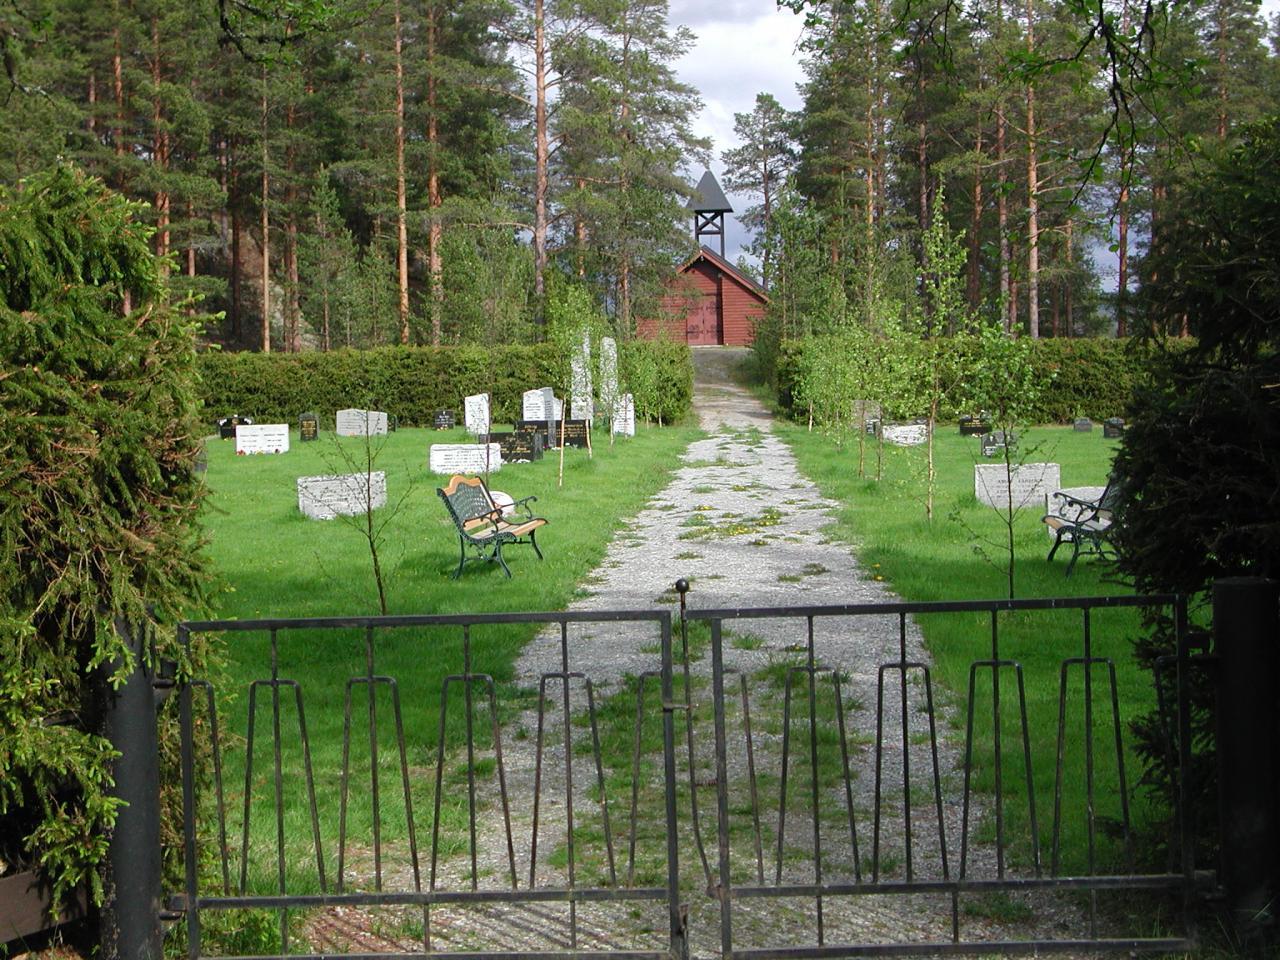 https://folldal.kirken.no/img/11_07_07_Egnund_kirkegaard/Egnund_kpl_vaar.JPG